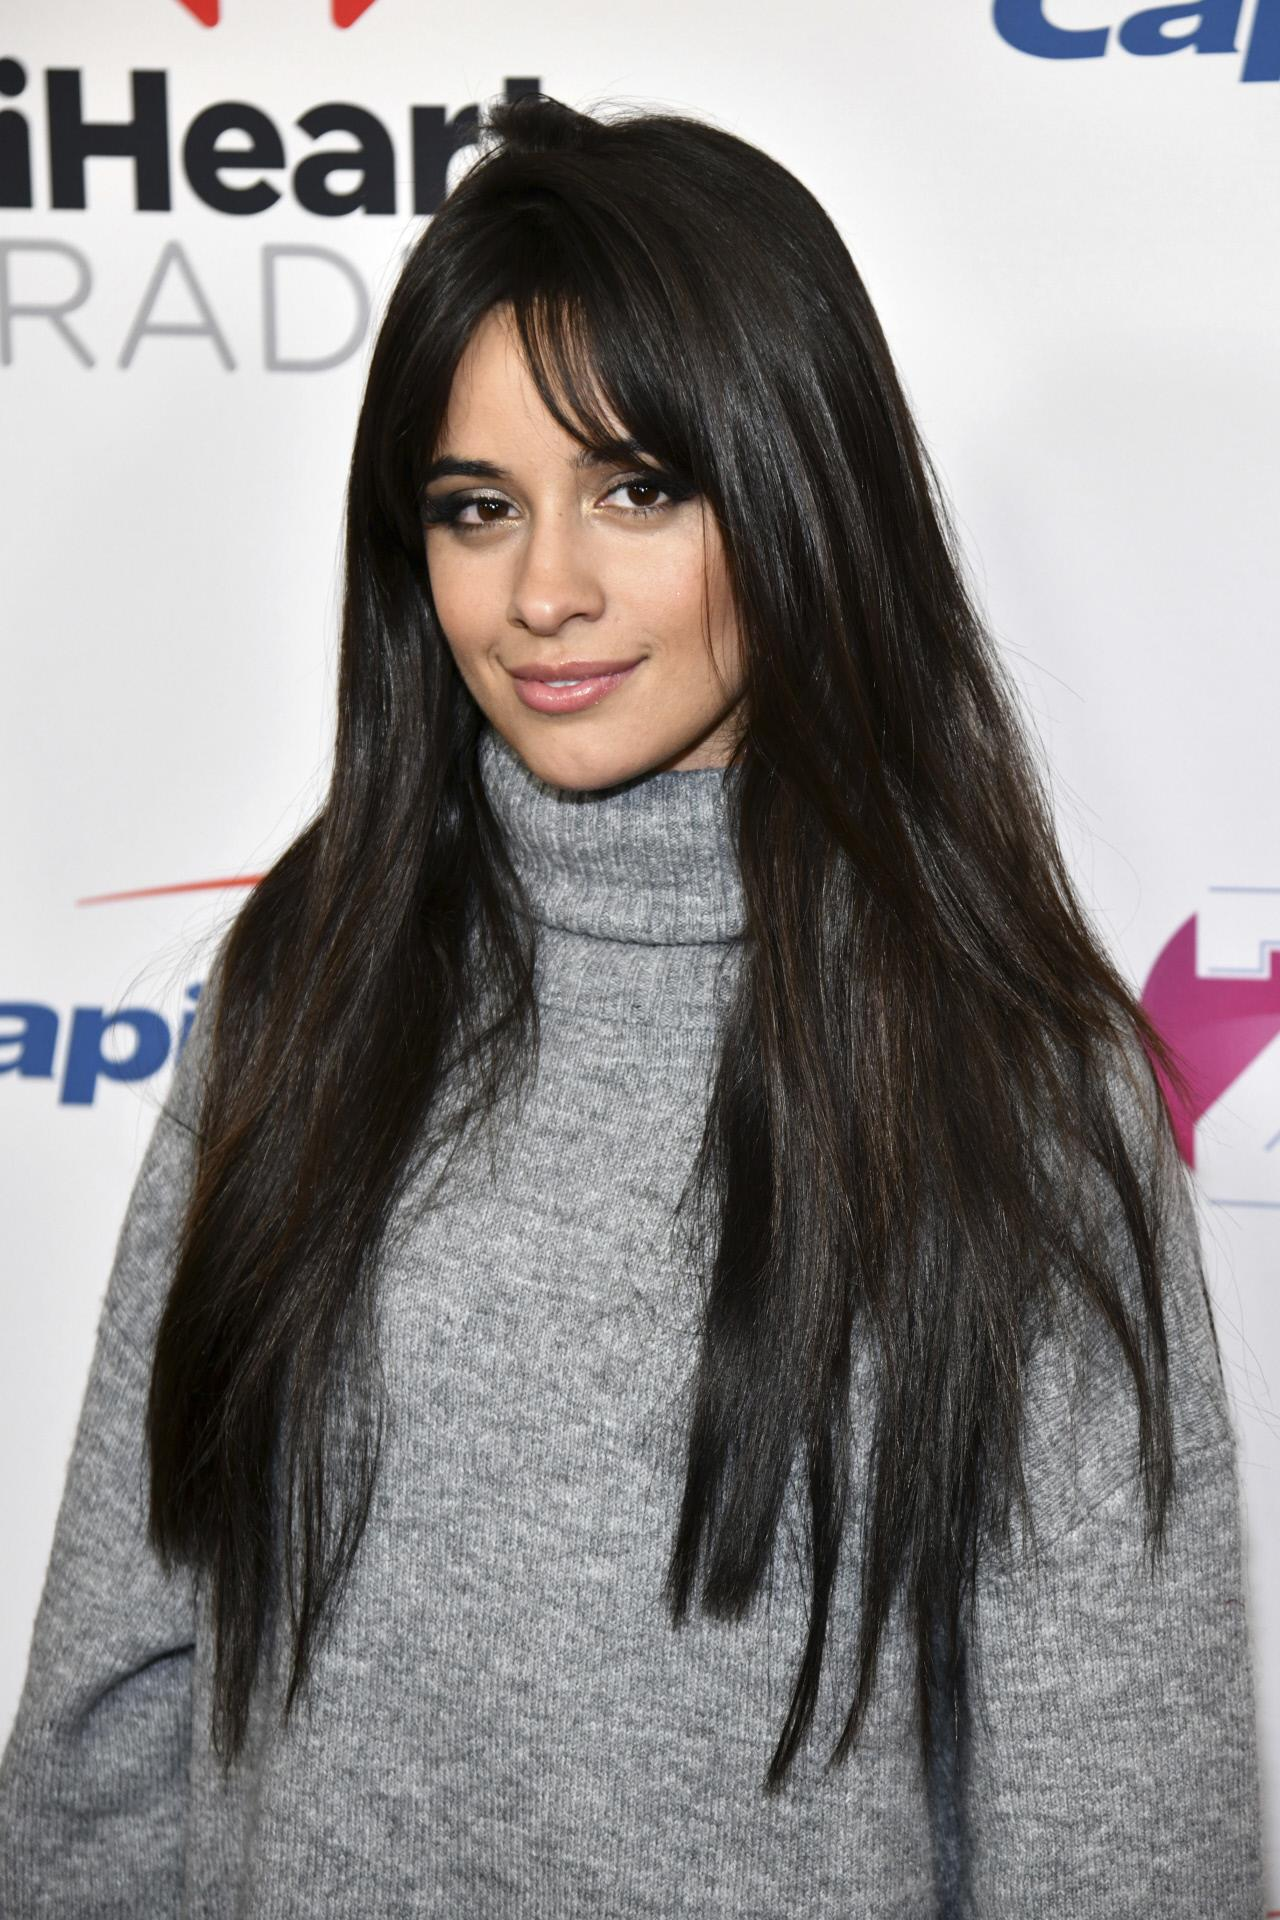 Corte de pelo mujer flequillo largo